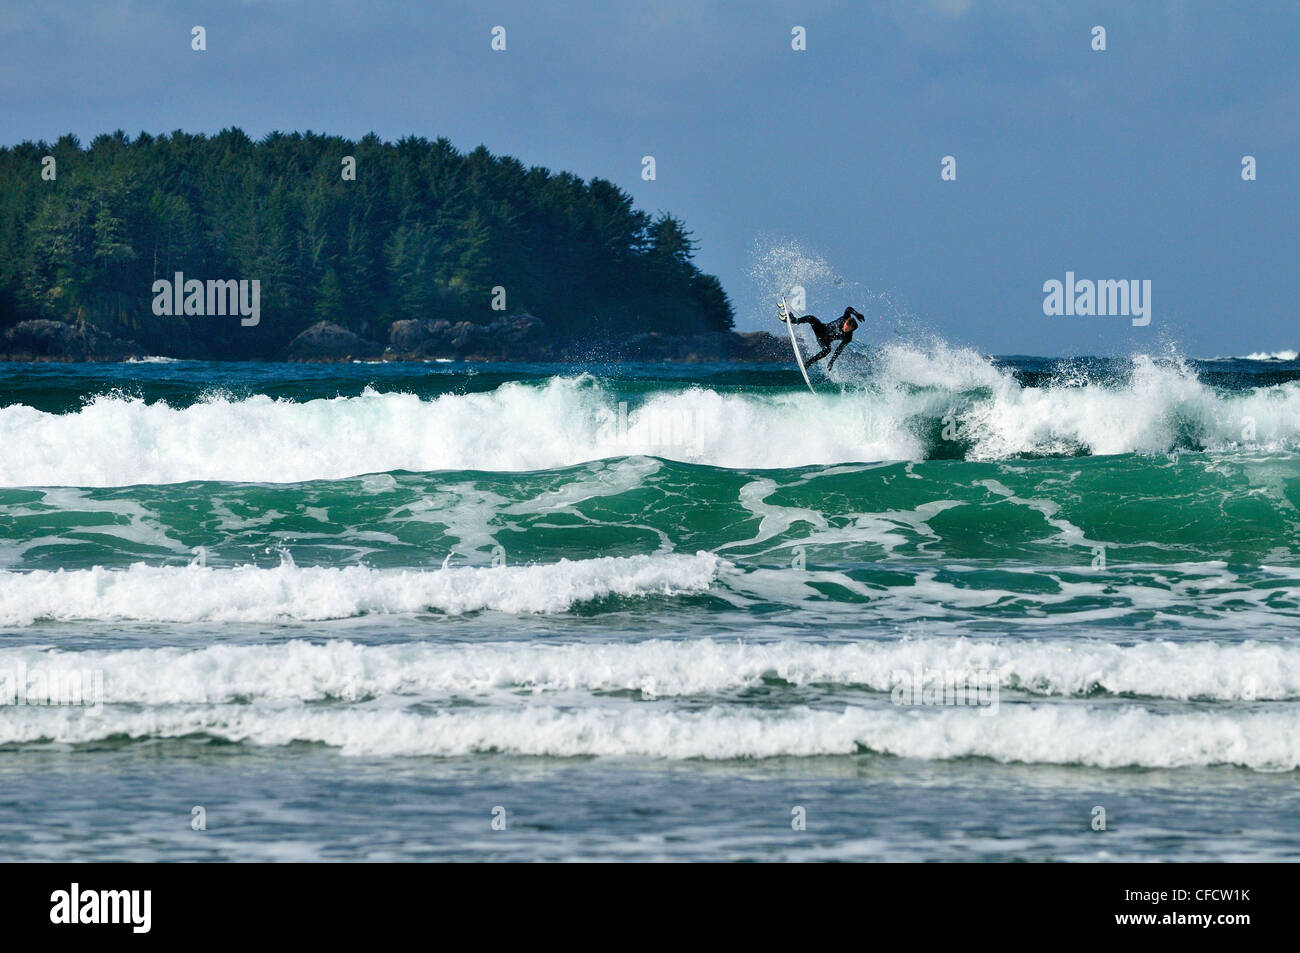 Airborne surfer on surf at Chesterman Beach in Tofino, British Columbia, Canada. - Stock Image